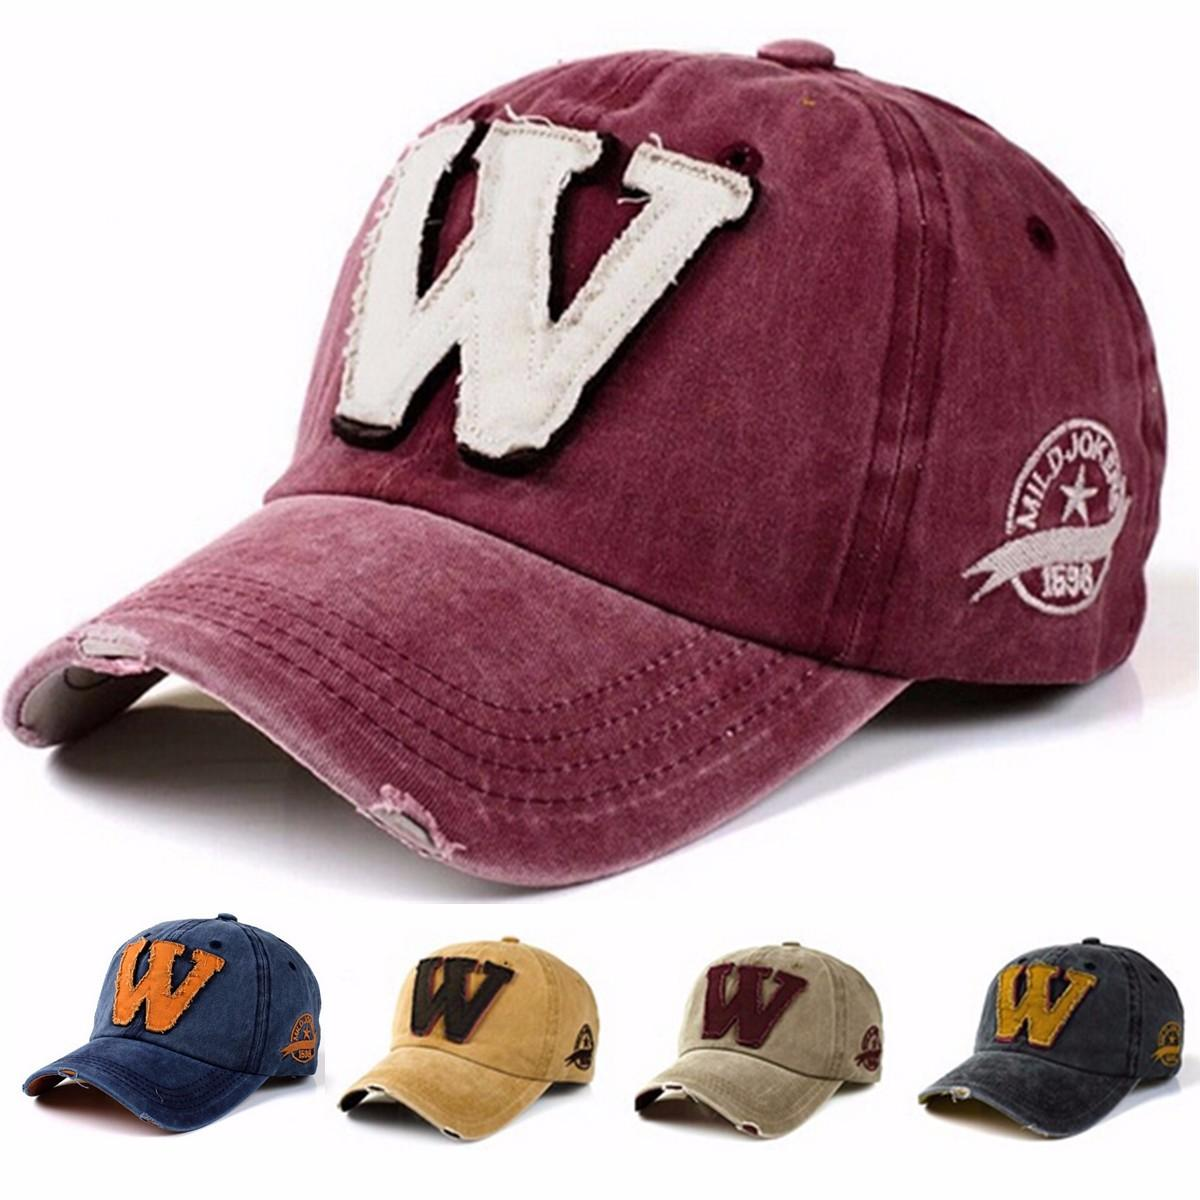 c5f12a5767f Unisex Letter W Embroidery Denim Washed Baseball Cap Vintage Adjustable  Snapback Hat COD